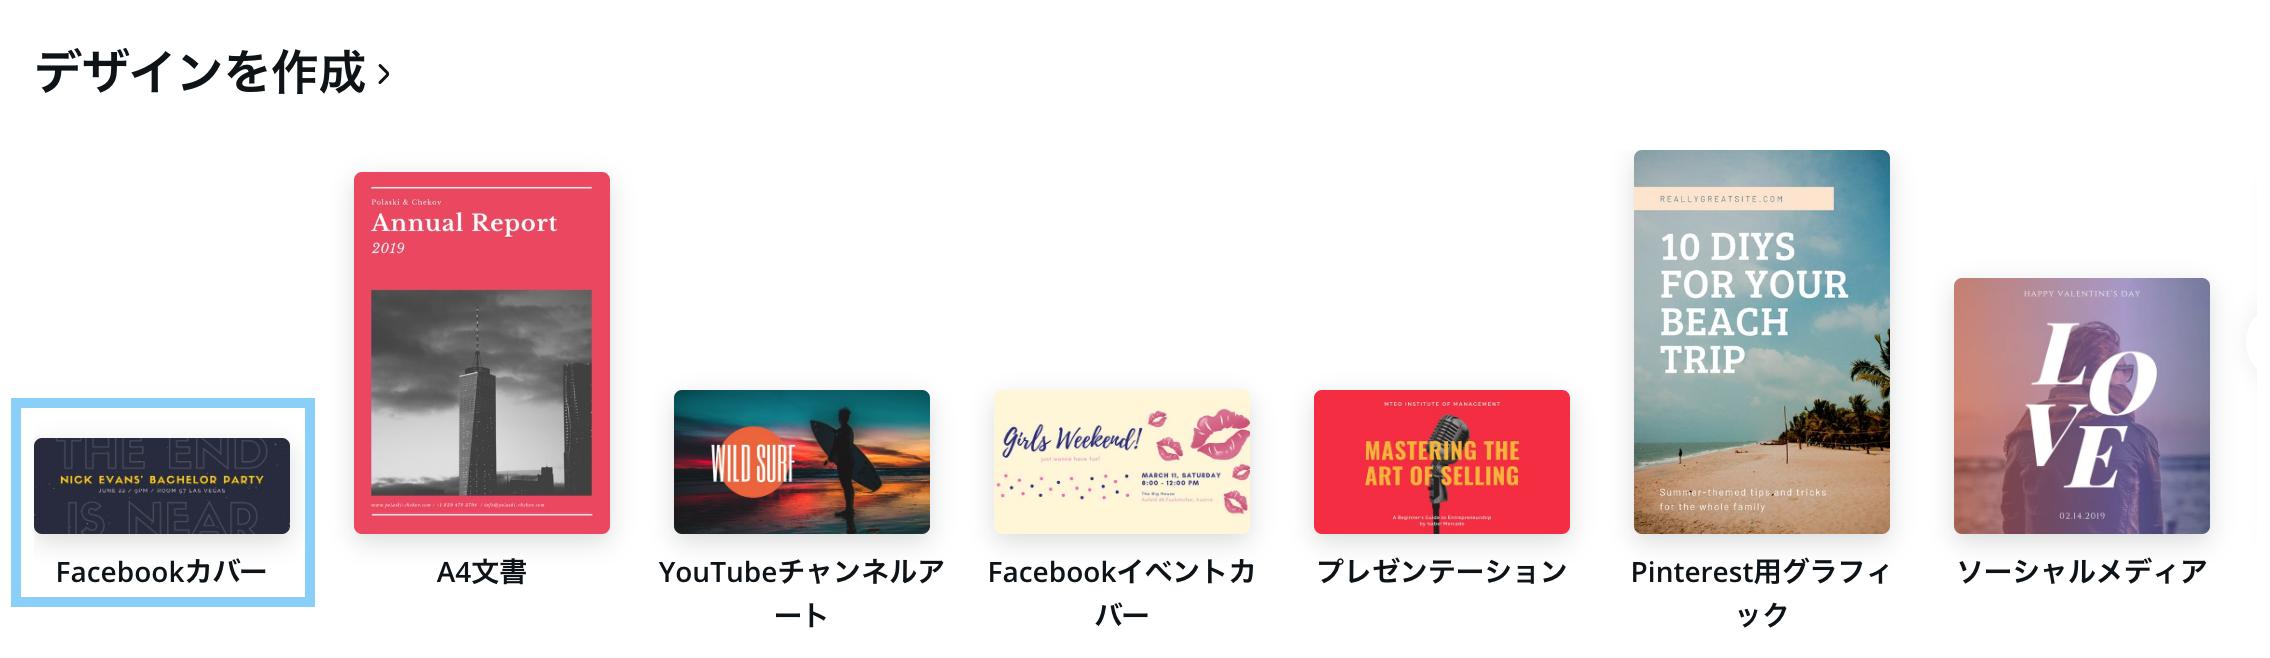 Canva Faceboookのカバー画像